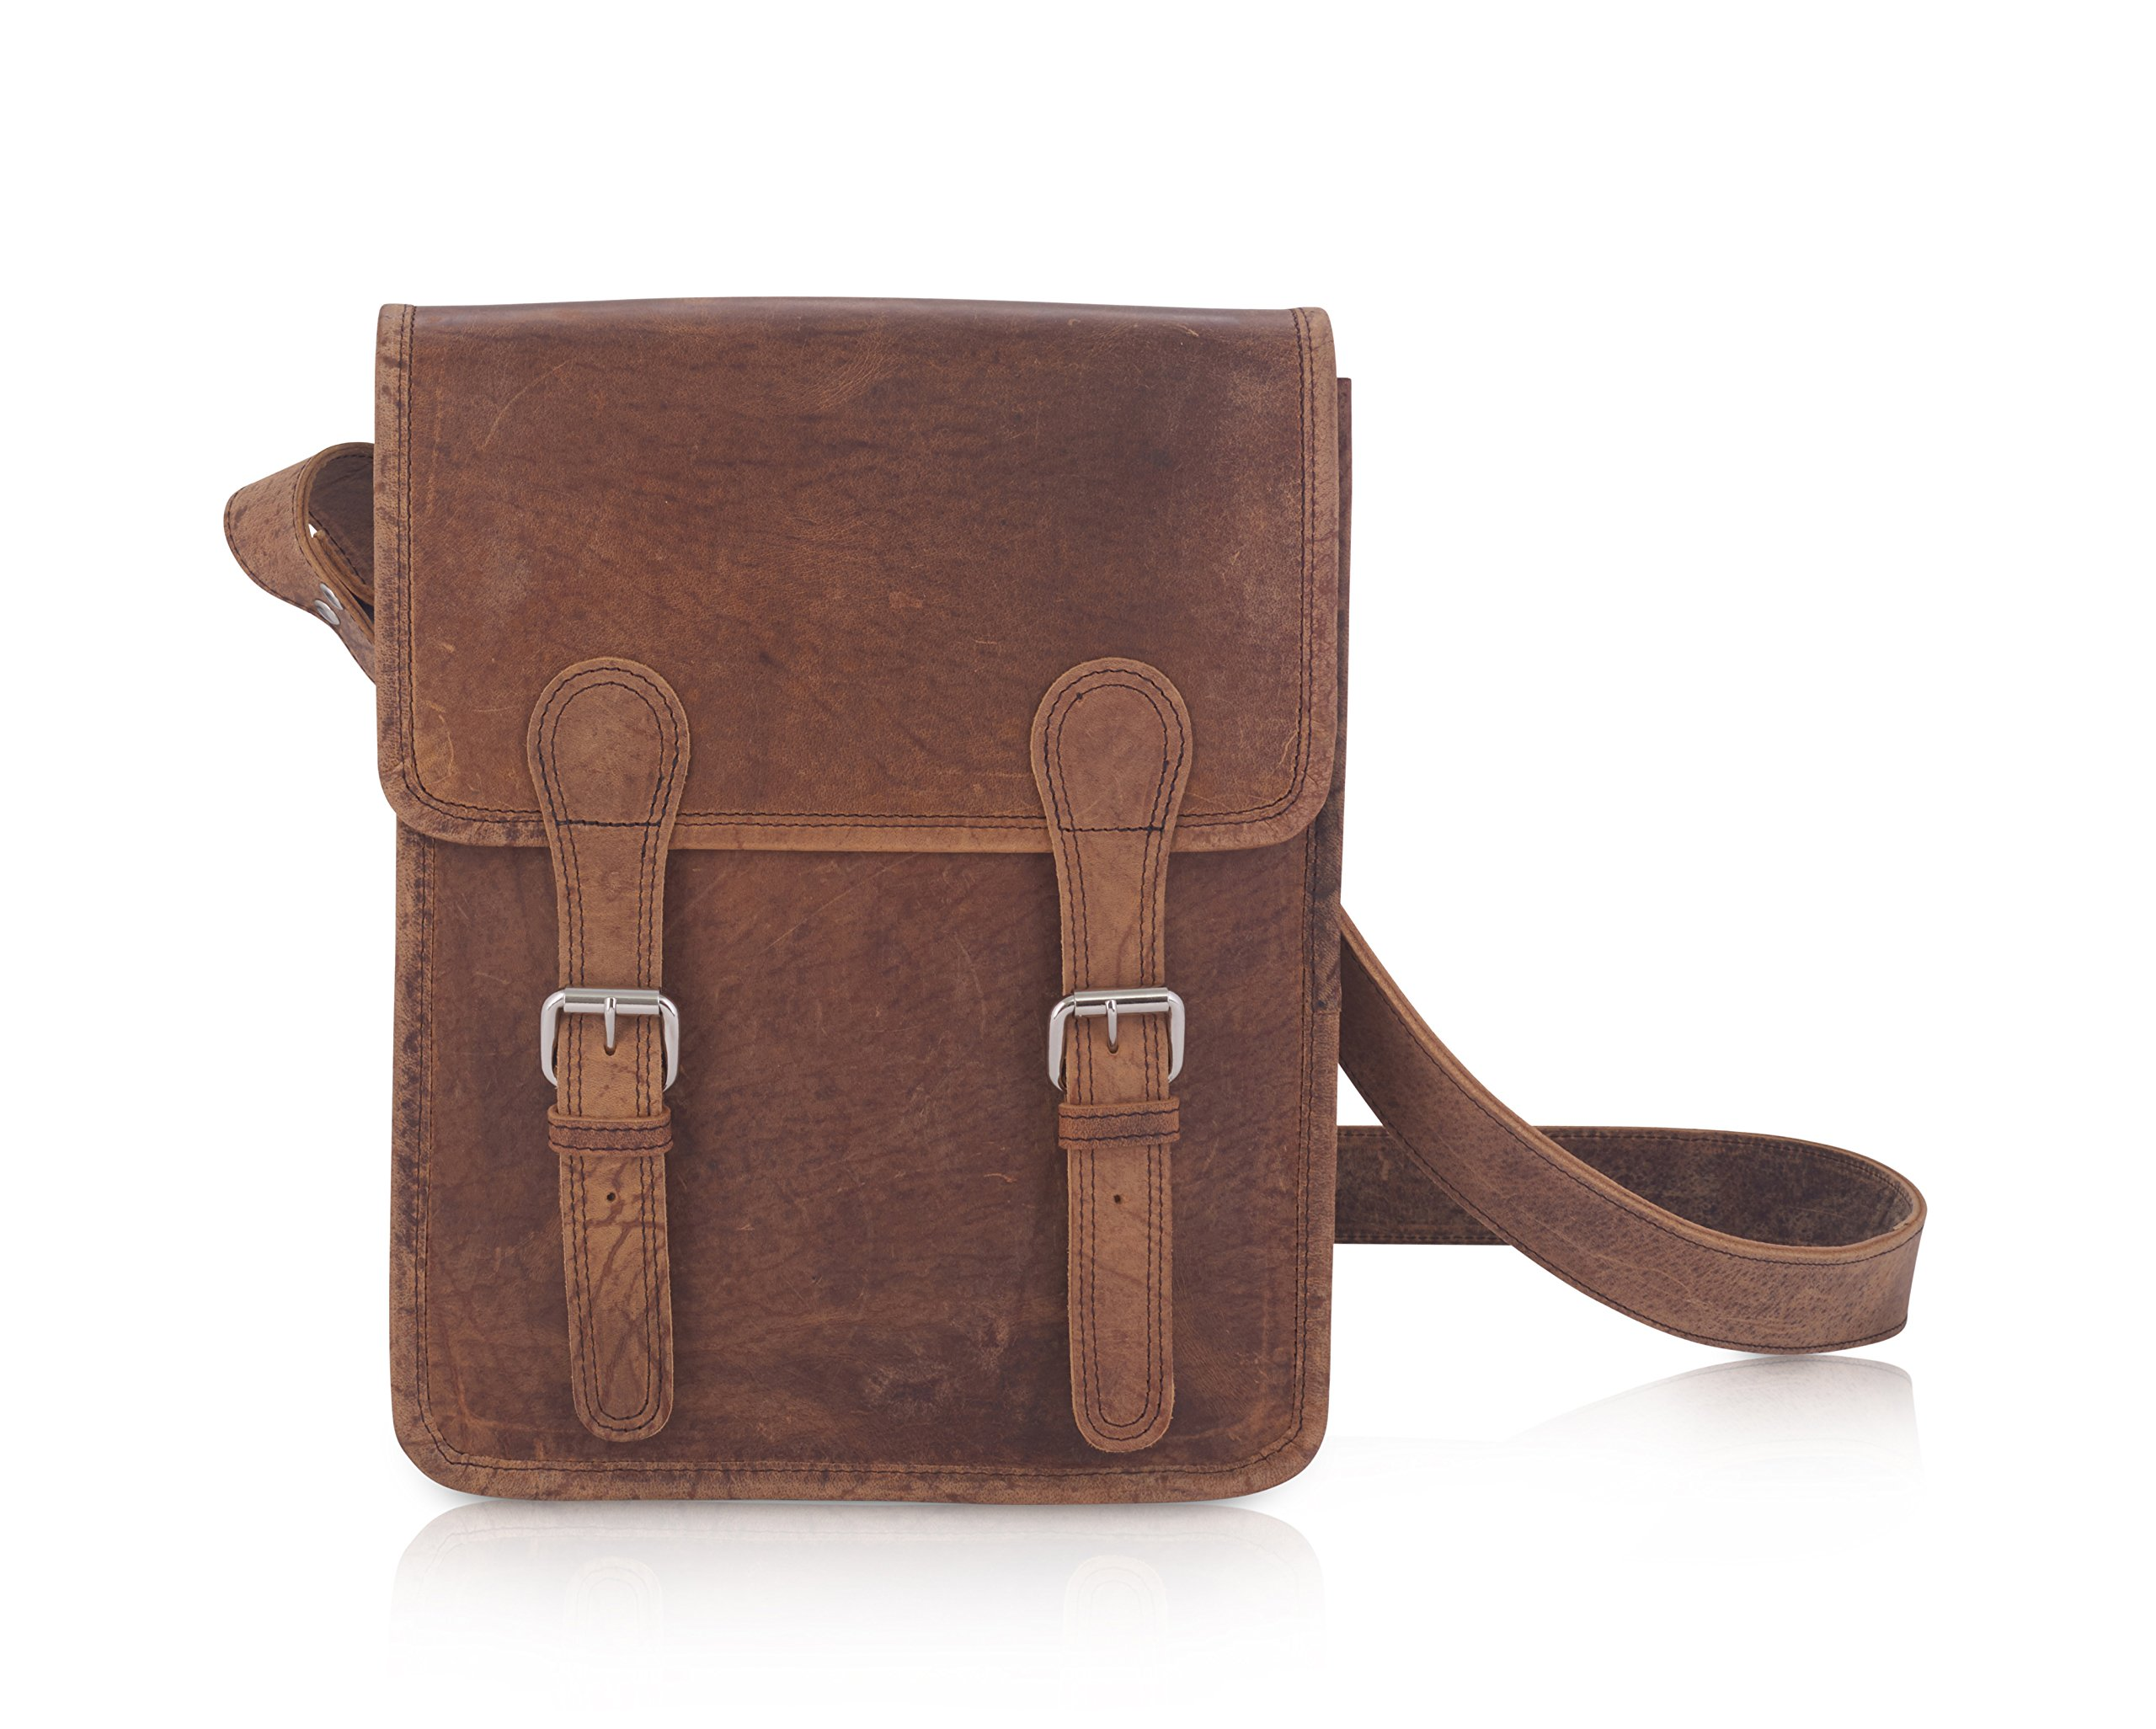 Komalc 11 Inch Vintage Hunter Leather Satchel for Ipad / TabletsSALE by KomalC (Image #1)